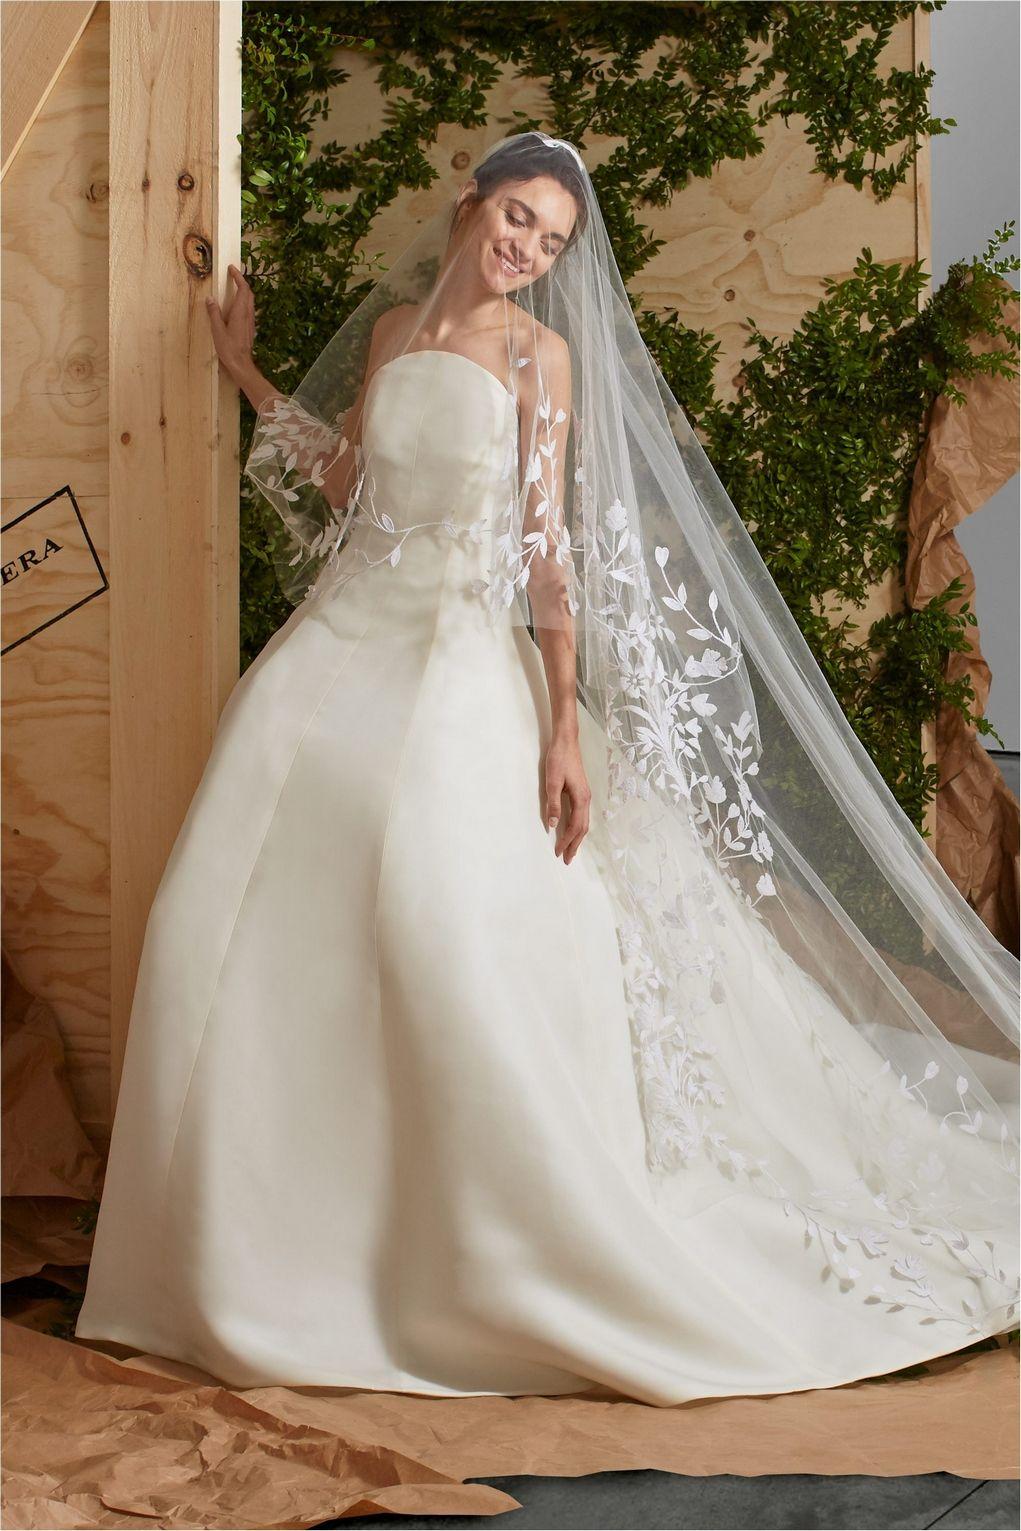 27 dresses wedding dress   New Spring Summer  Wedding Dresses Trends and Ideas